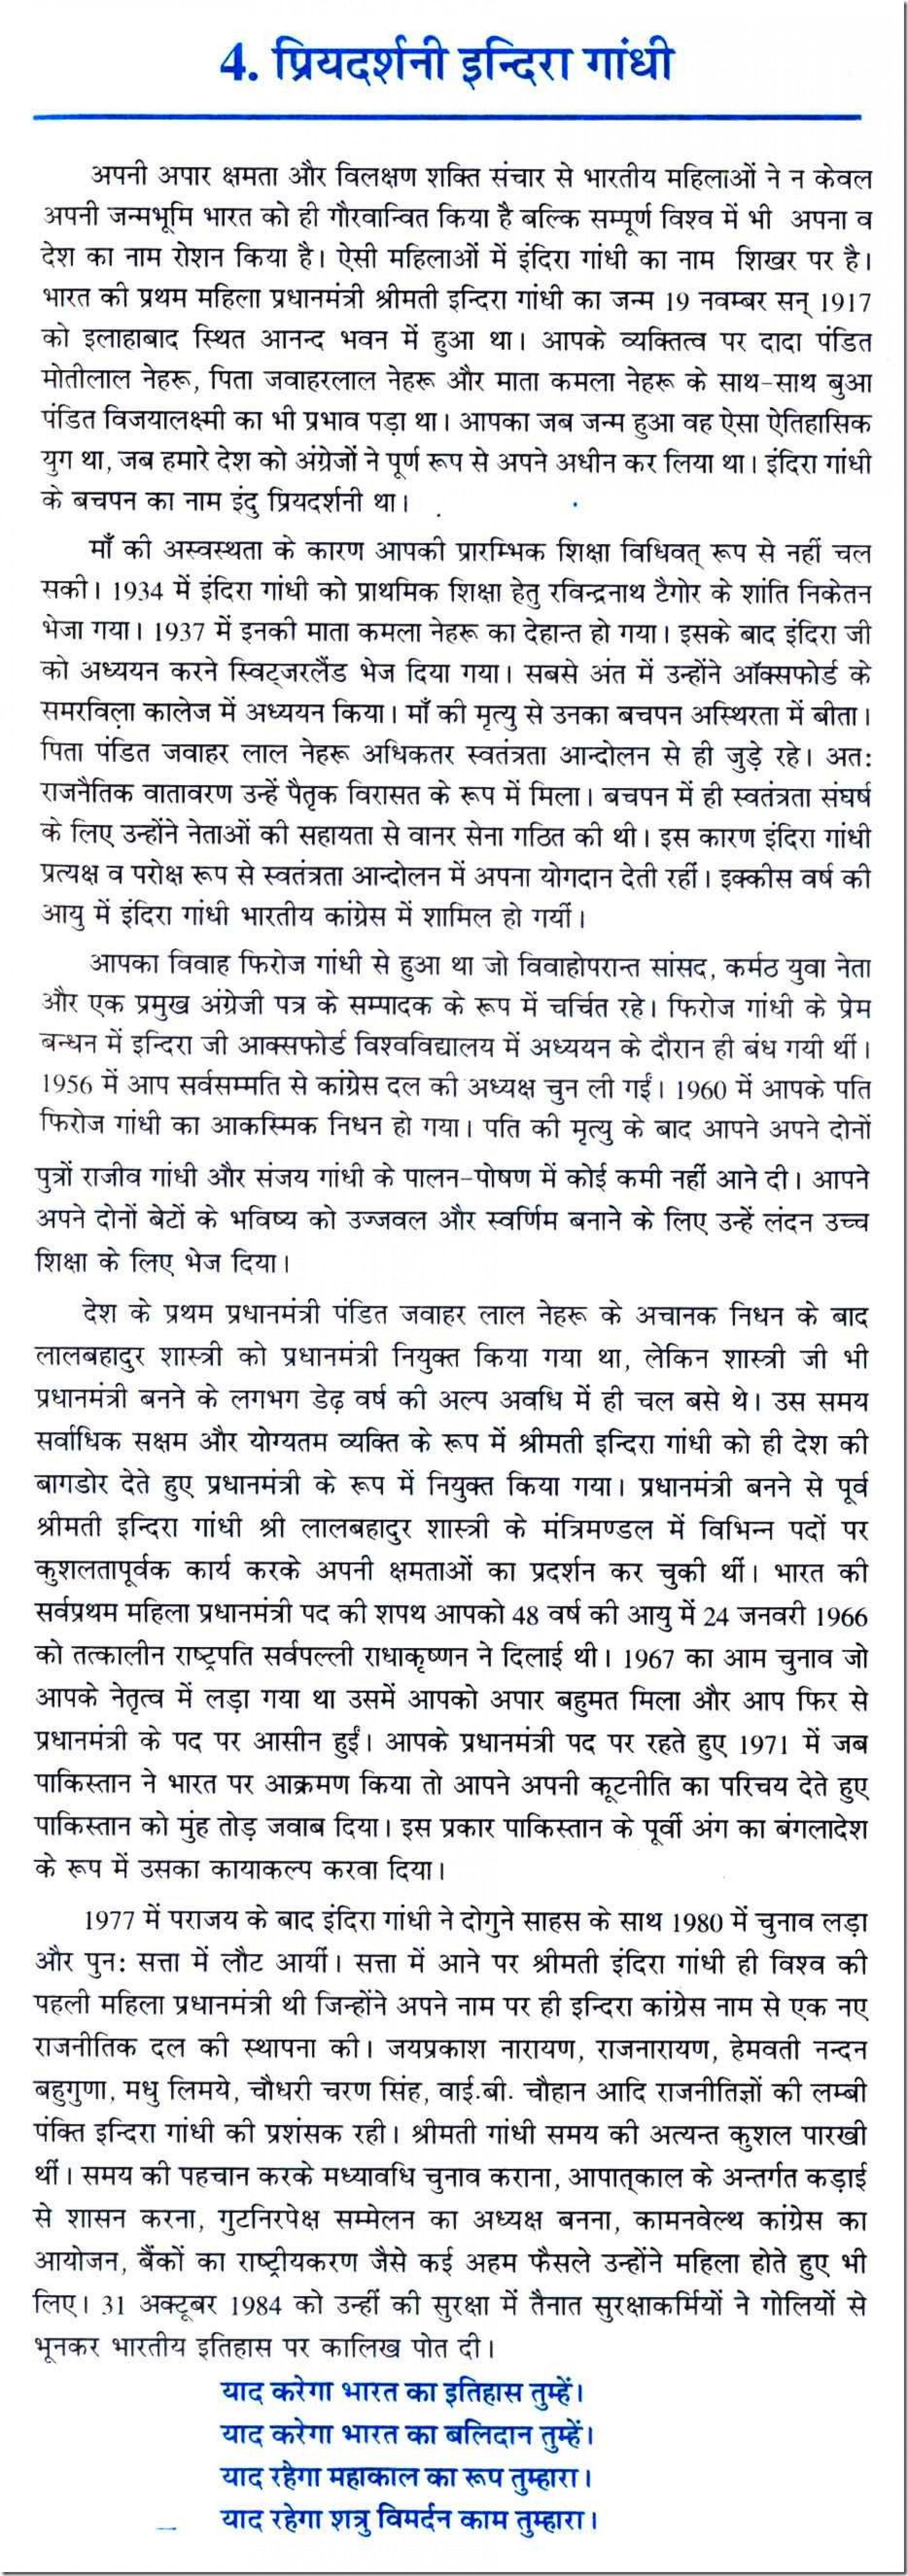 013 Mahatma Gandhi Essay In Urdu Example Questions Mfacourses887webfc2com L Imposing Language Jayanti Speech 1920